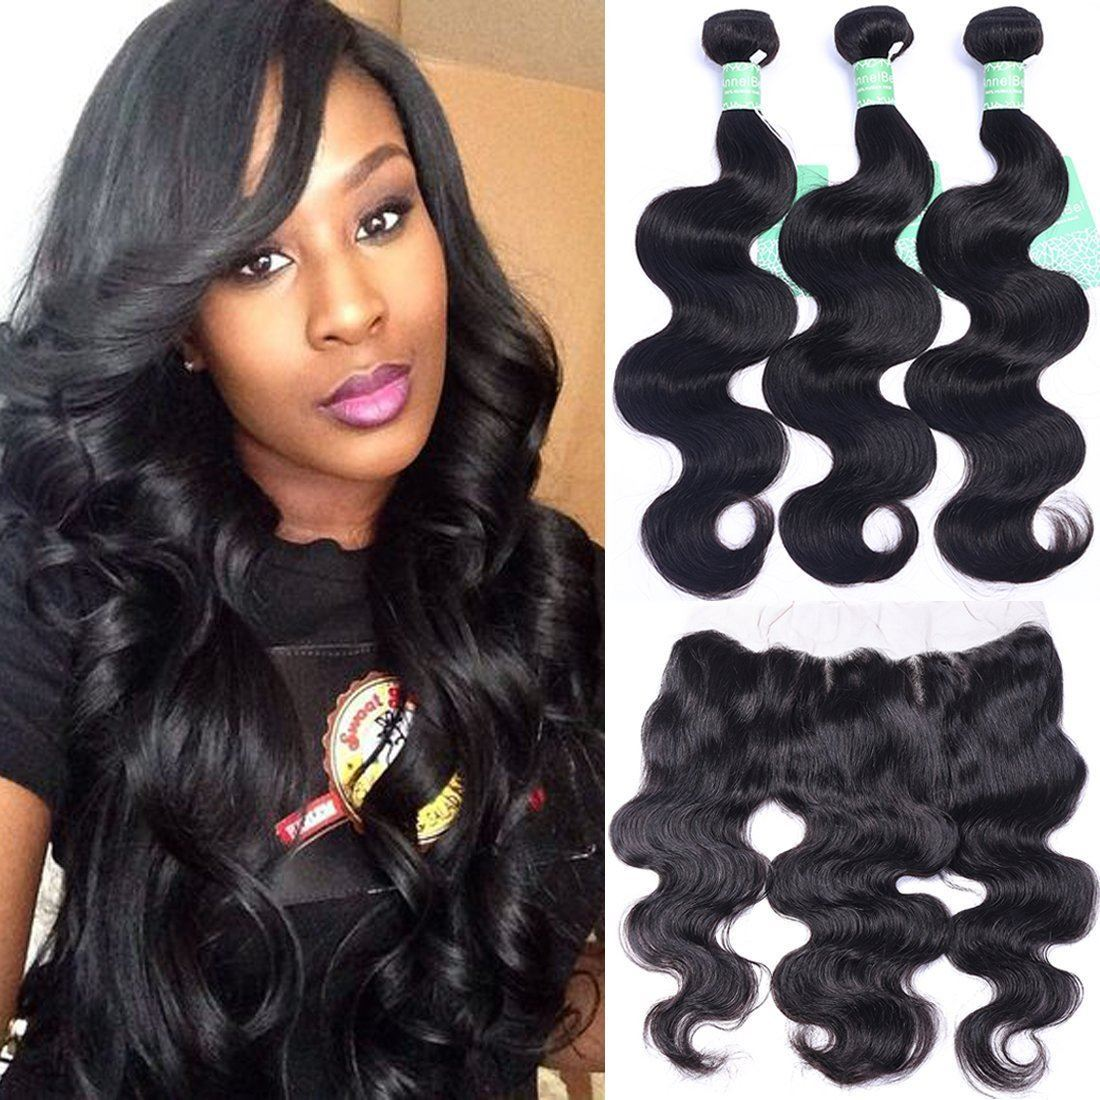 Annelbel Human Hair Brazilian Hair Body Wave 3 Bundles With Lace